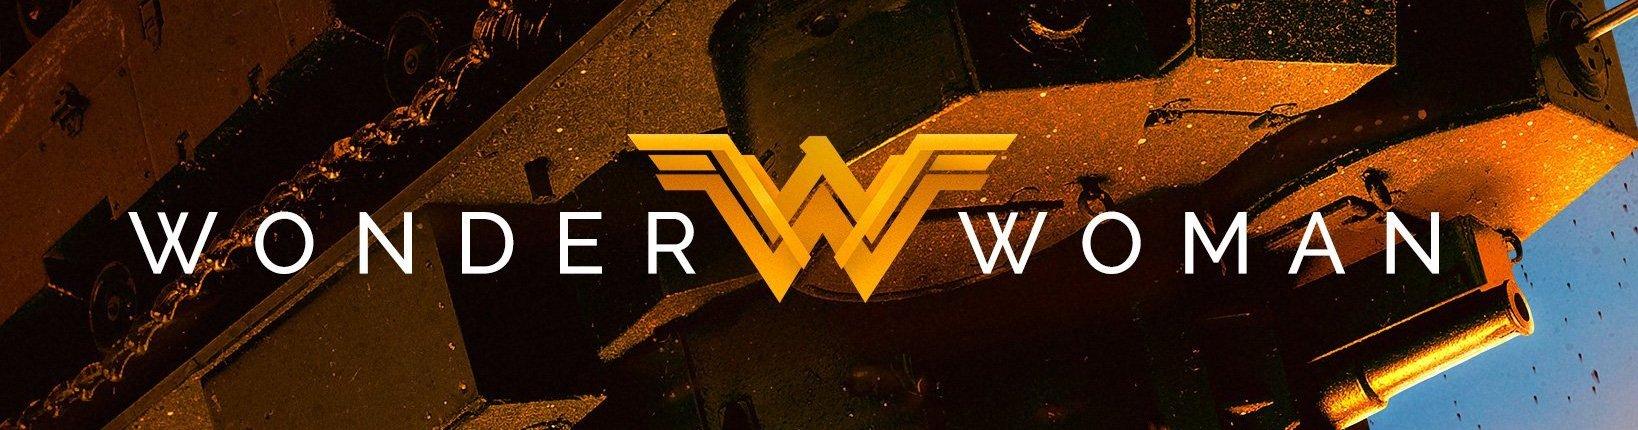 Wonder Woman Recension GGGG+ (inkl video)